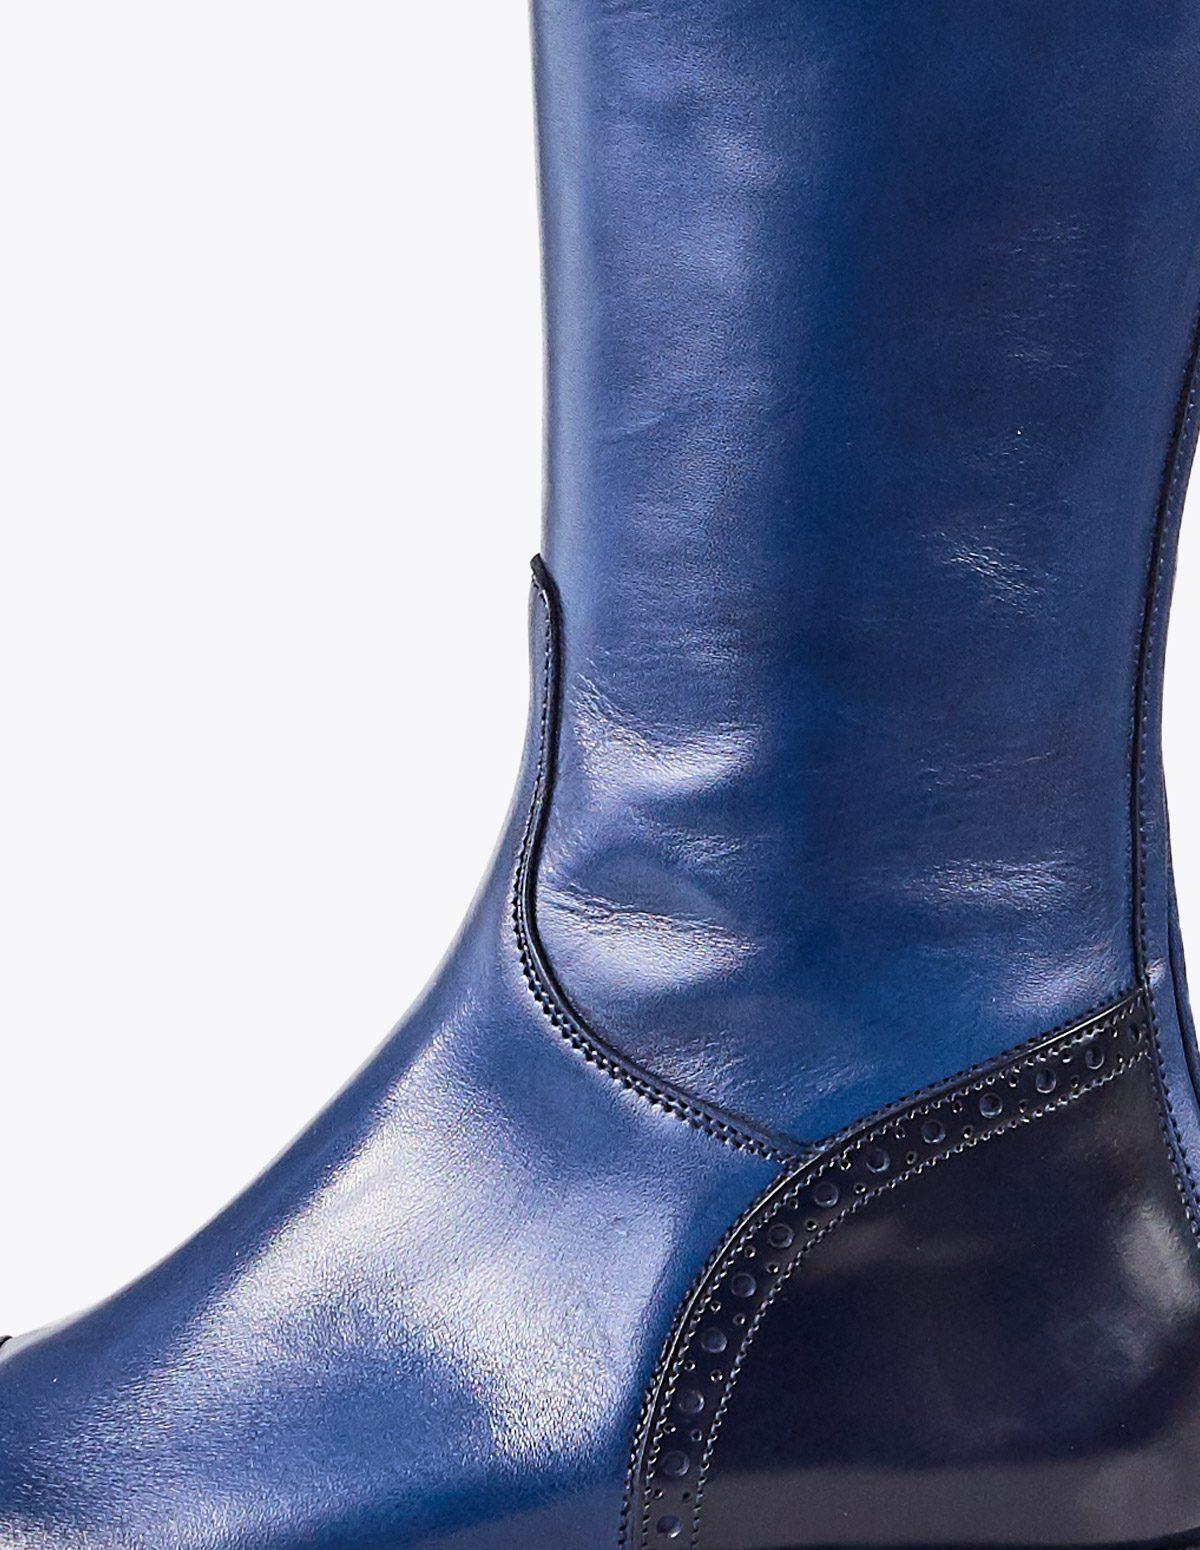 Bota budapest combi, tailor made shoes, schuhe nach mass en mandalashoes Santanyí Mallorca